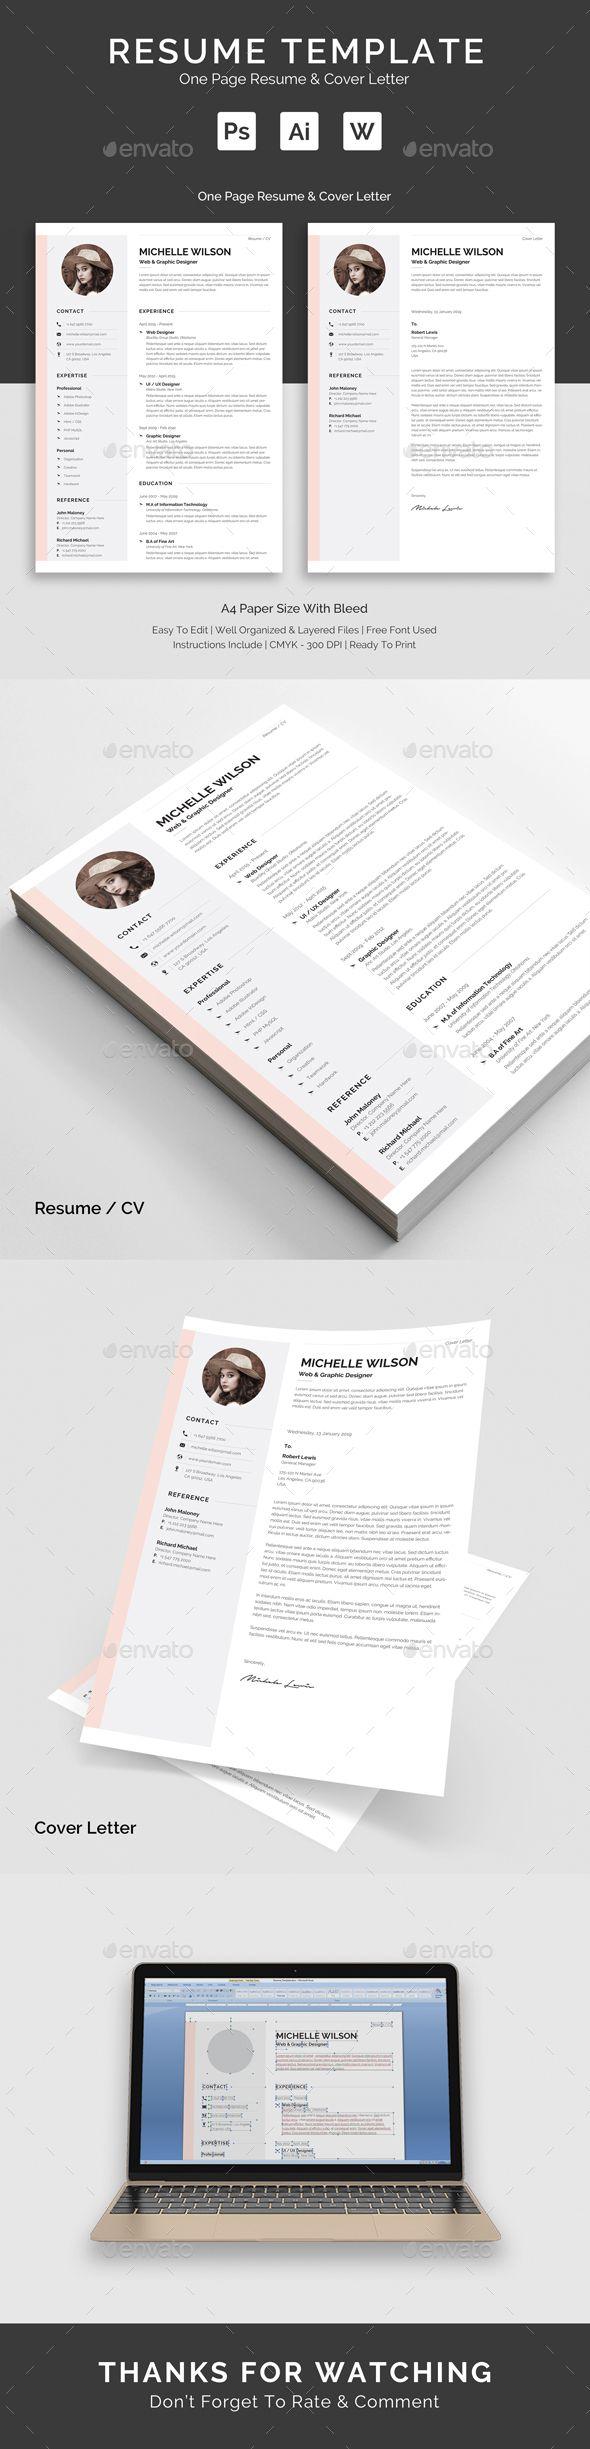 Resume Templates : Resume Template PSD, AI Illustrator, MS Word